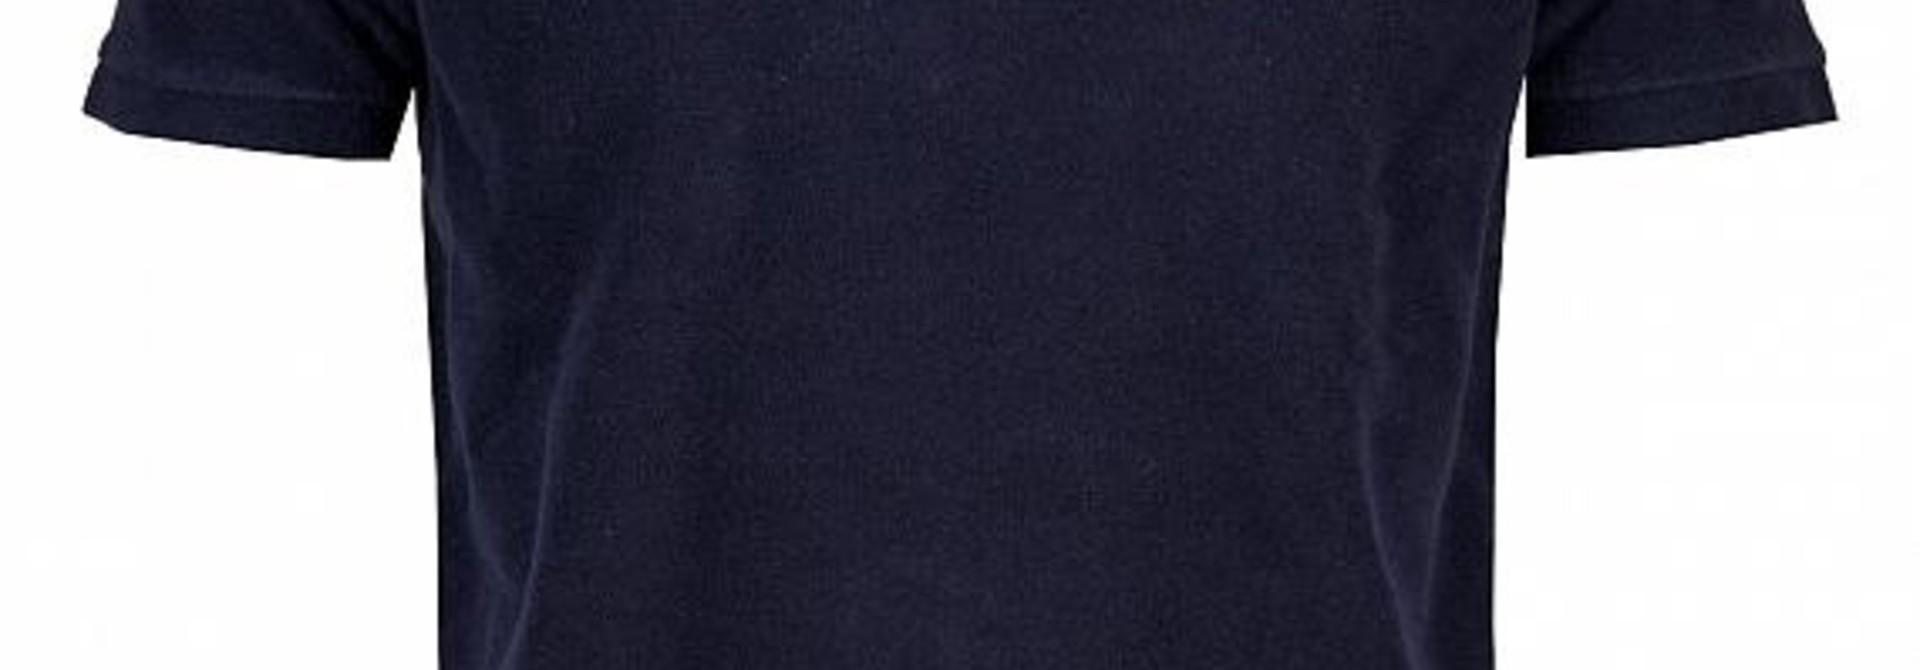 Towel polo alaska Blue